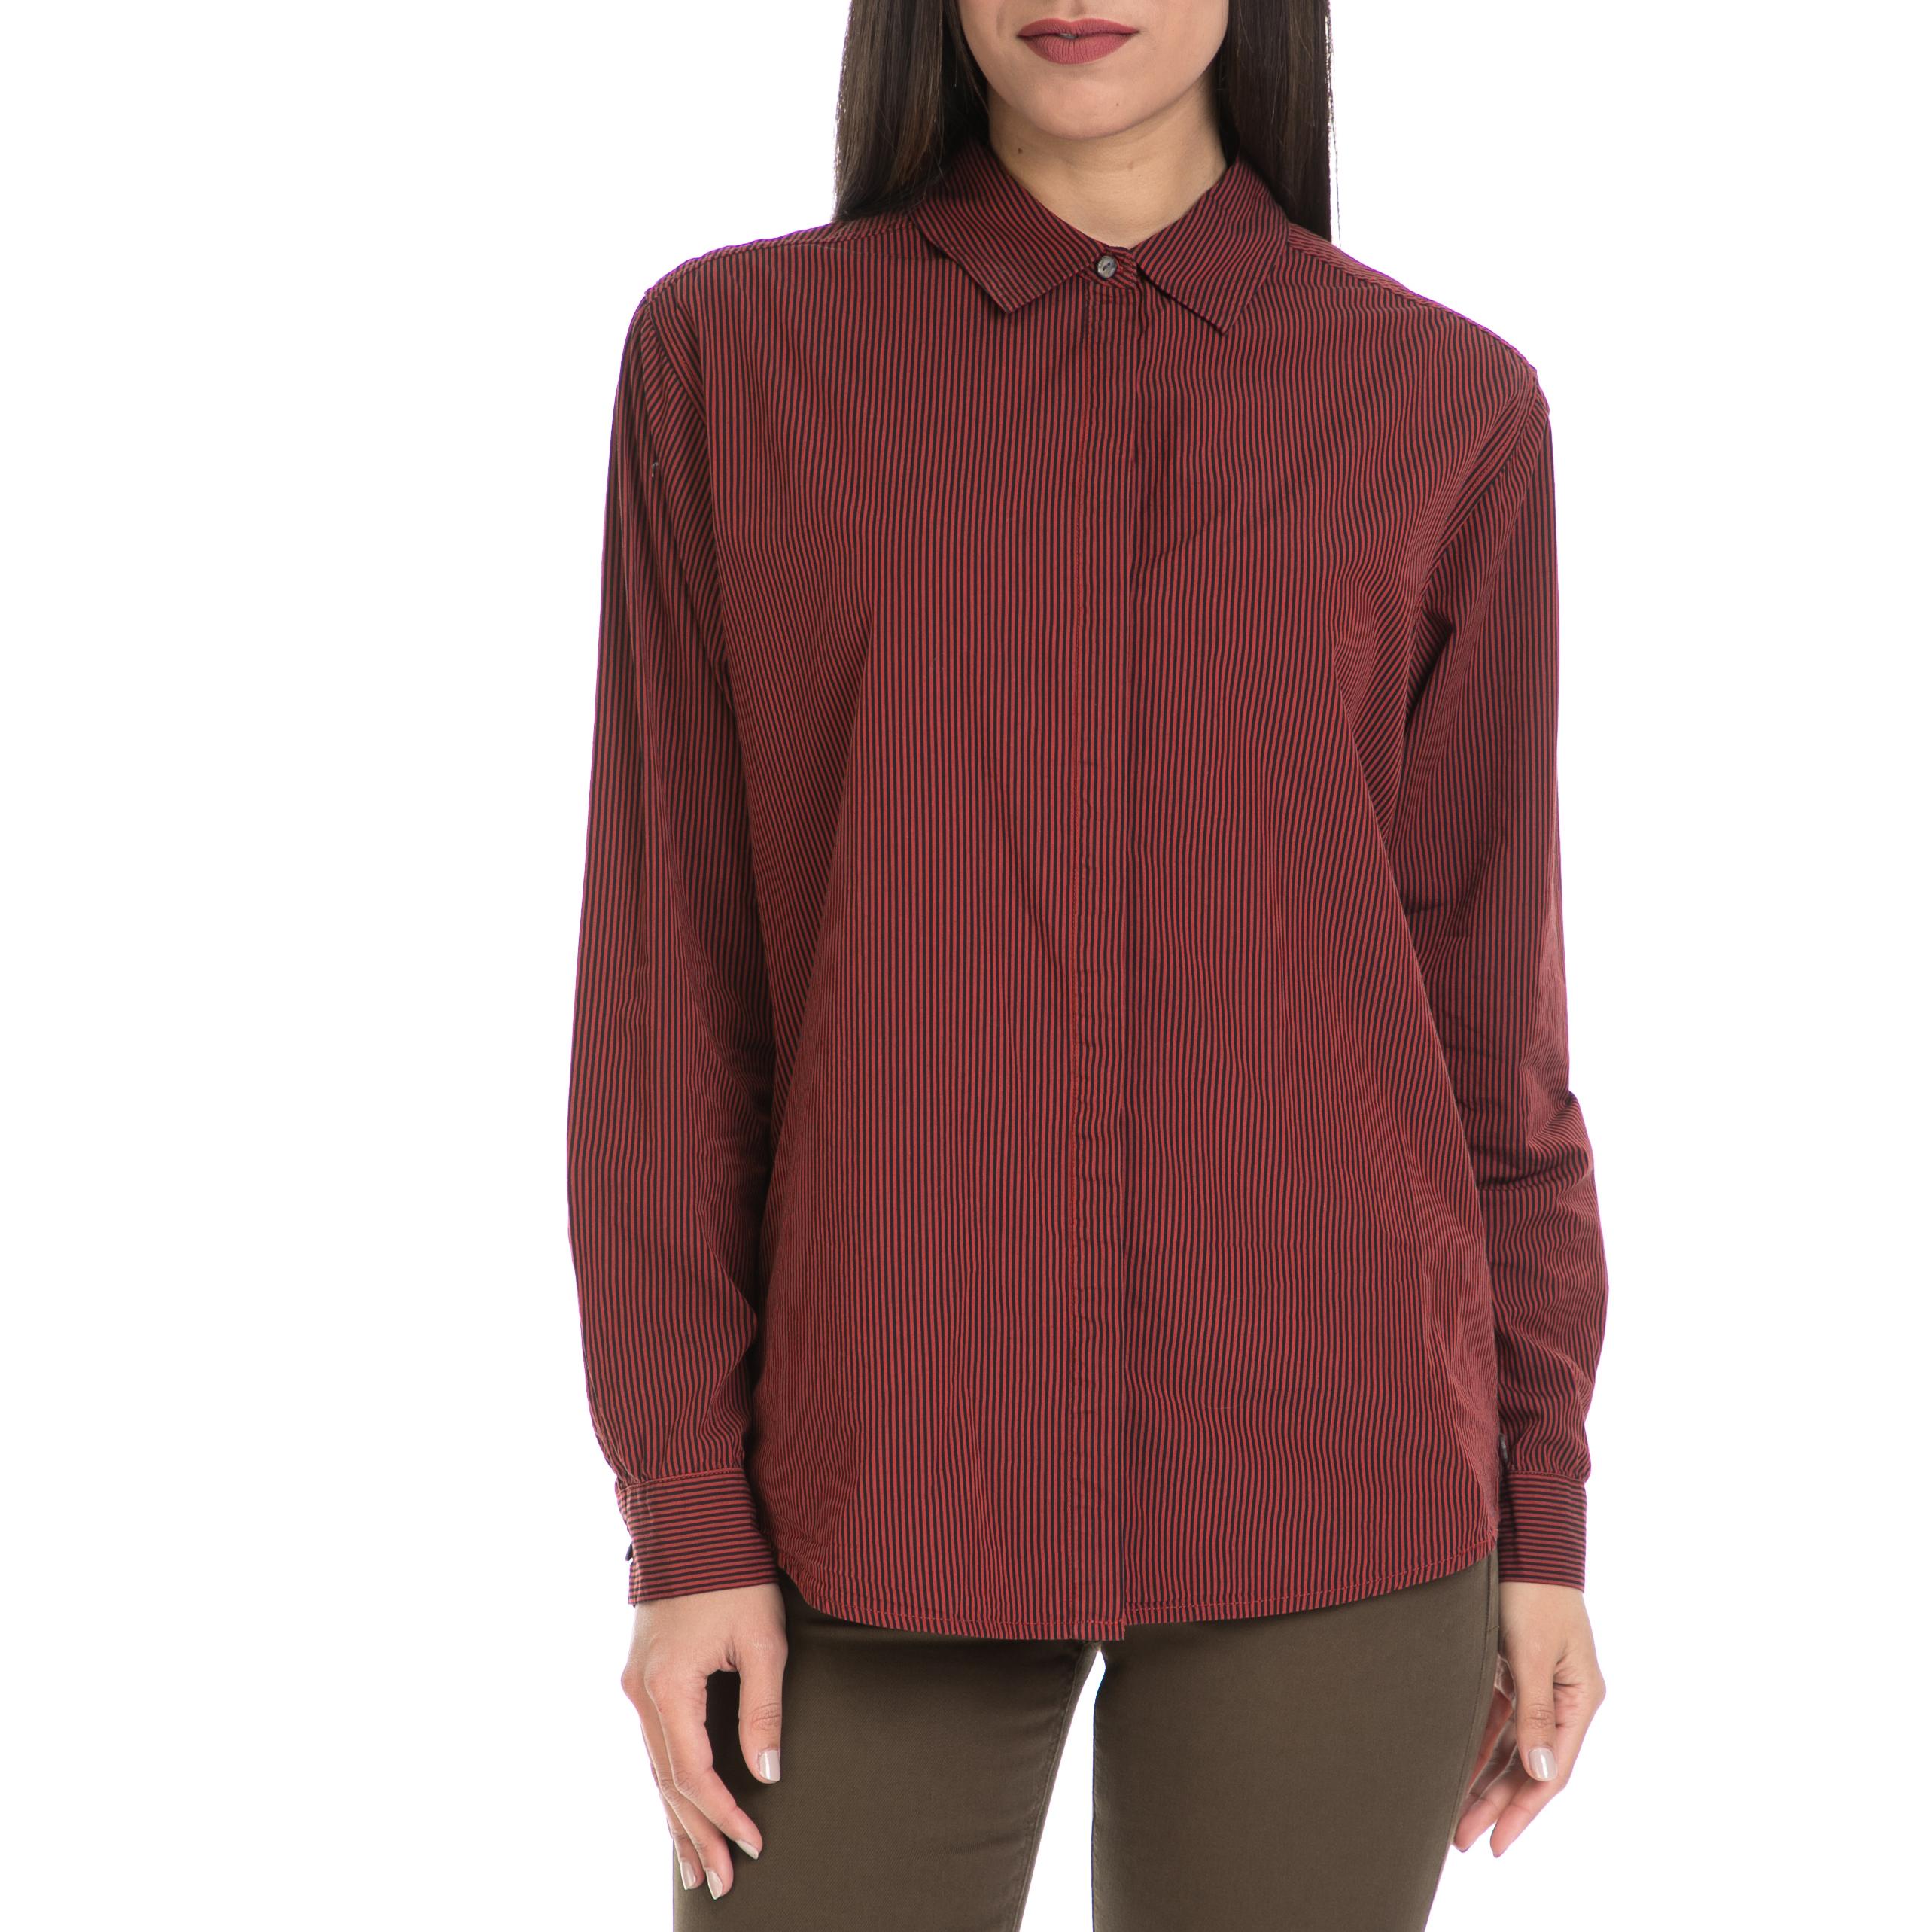 MAISON SCOTCH - Γυναικείο πουκάμισο MAISON SCOTCH μπορντό γυναικεία ρούχα πουκάμισα μακρυμάνικα